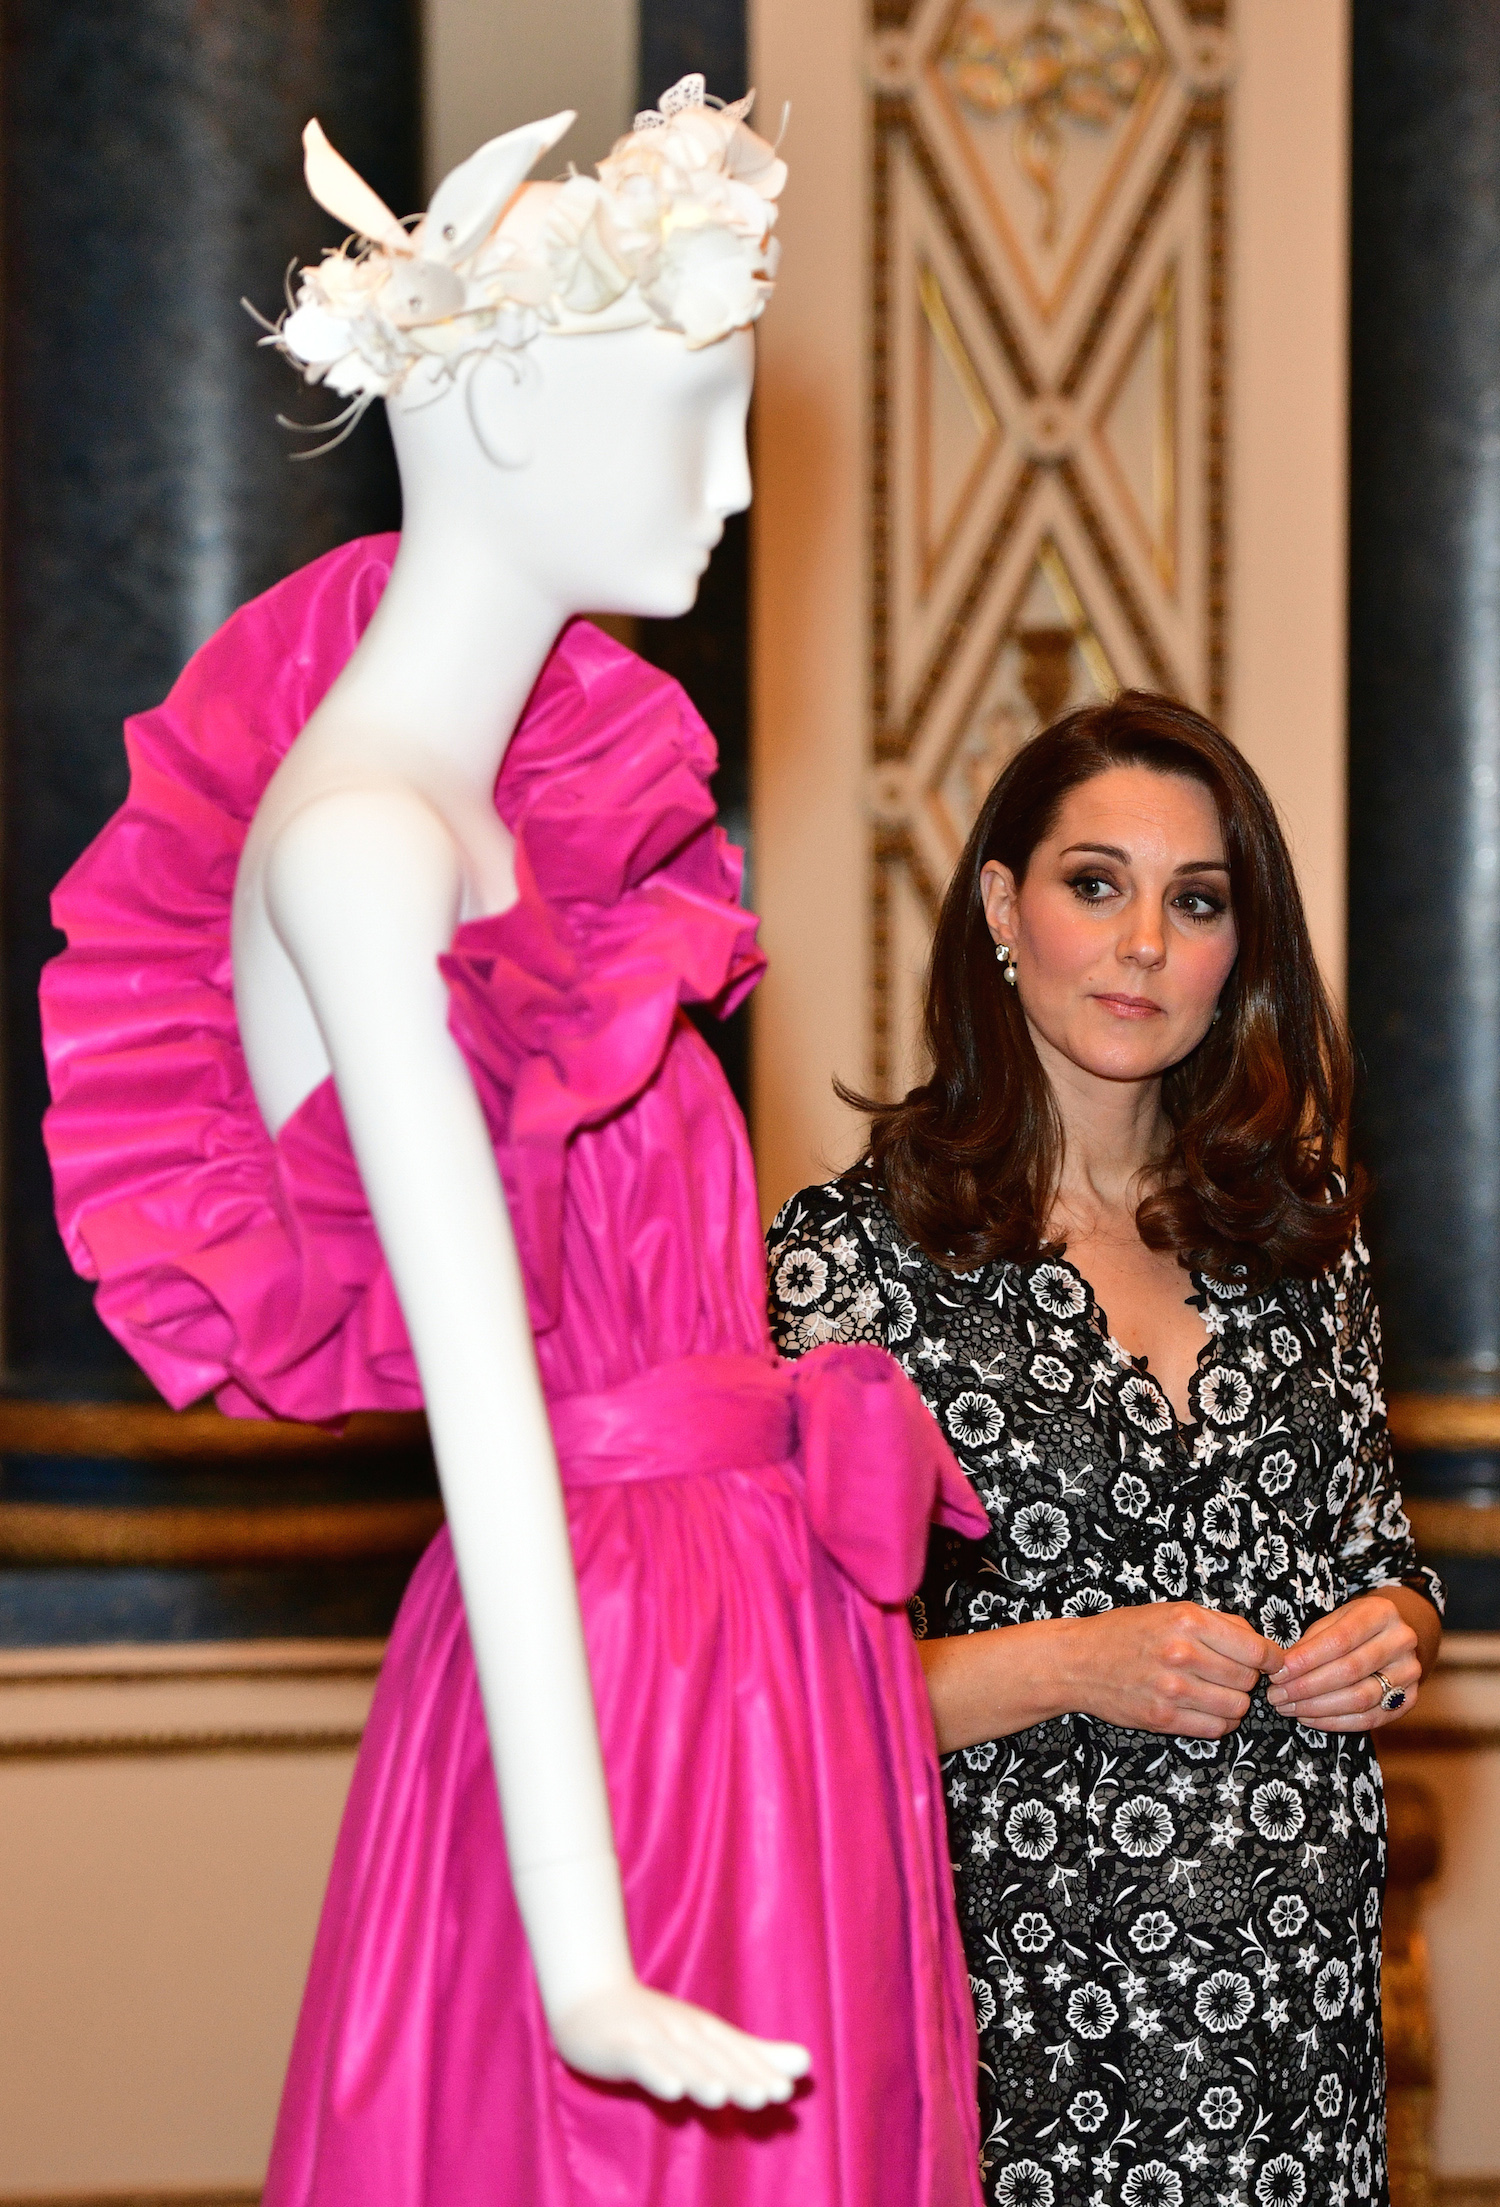 Kate Middleton  le vendite online la incoronano regina delle influencer  4e11891925b